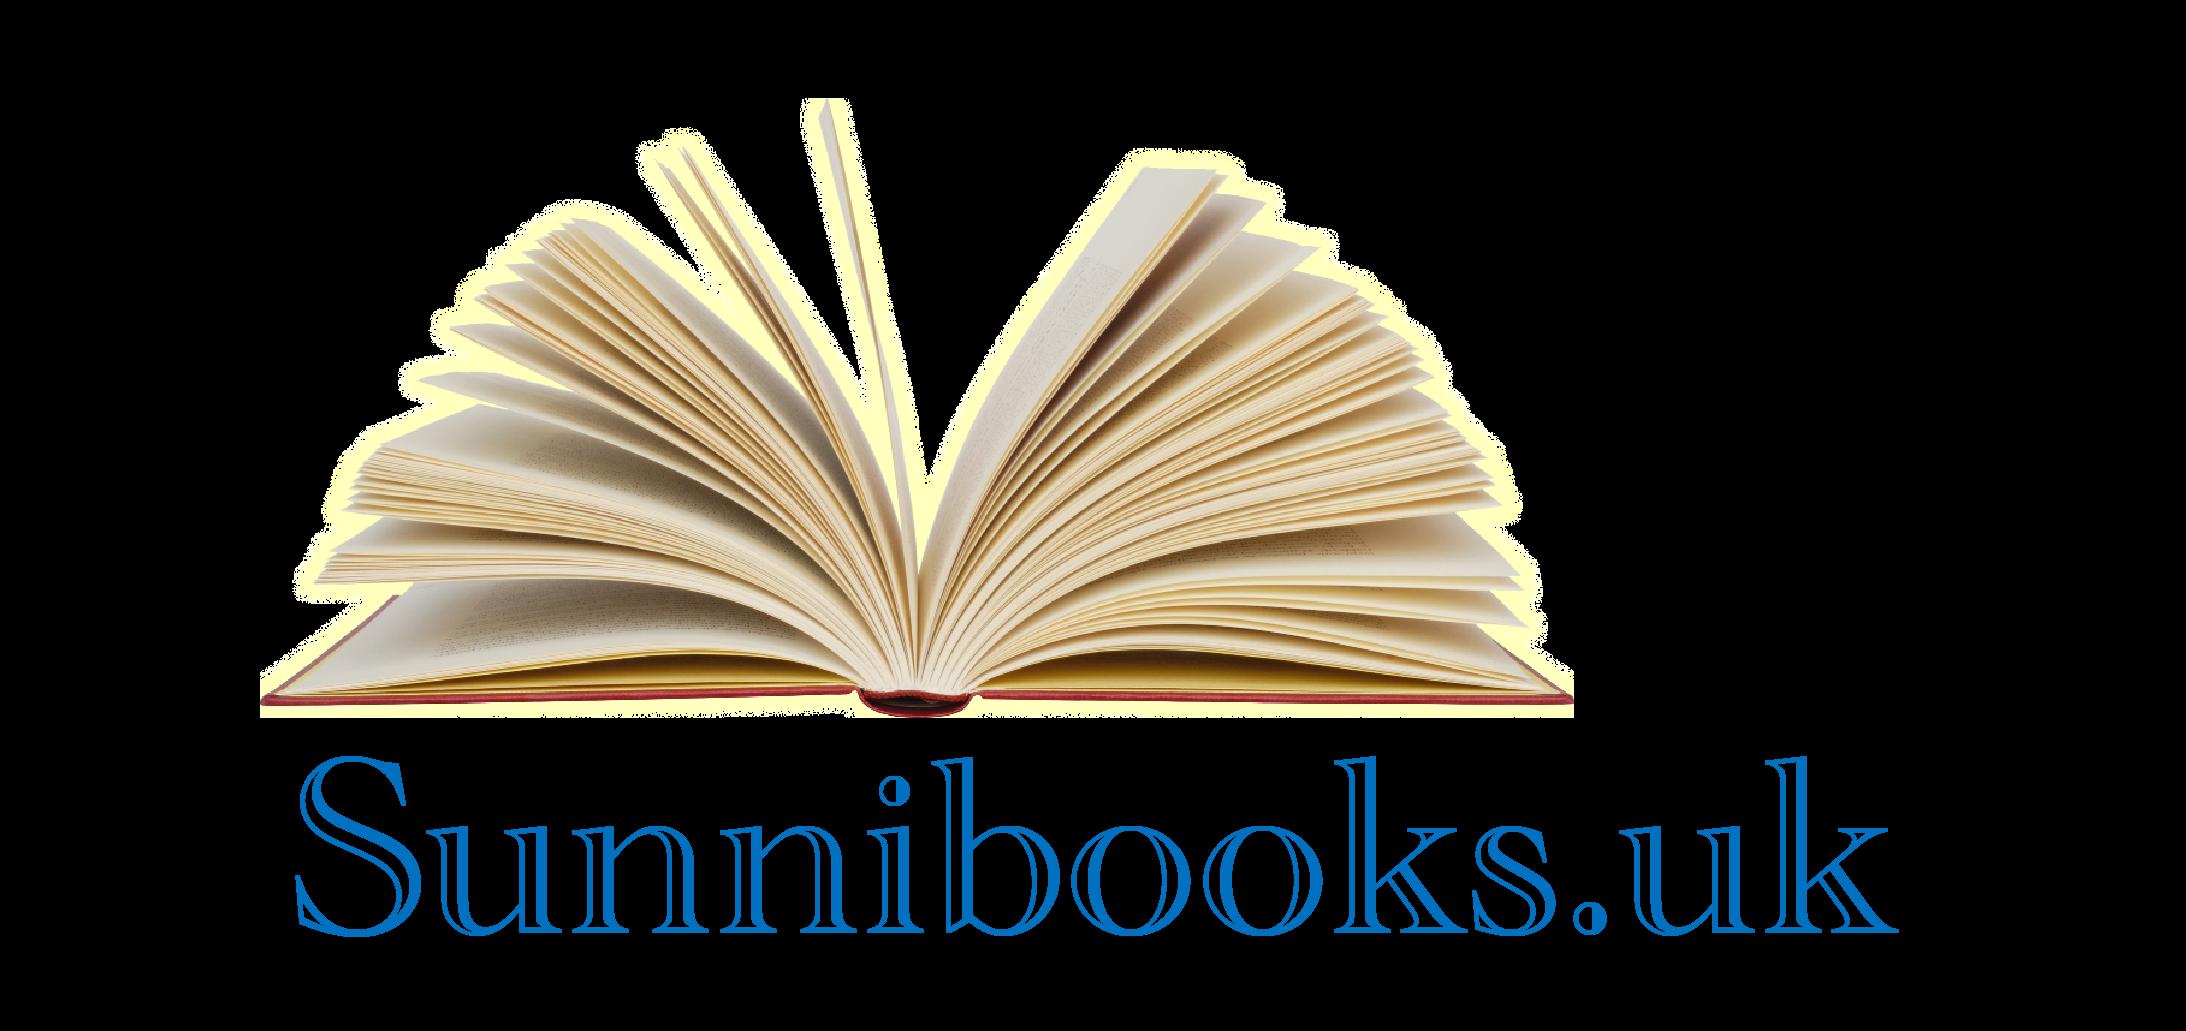 sunnibooks